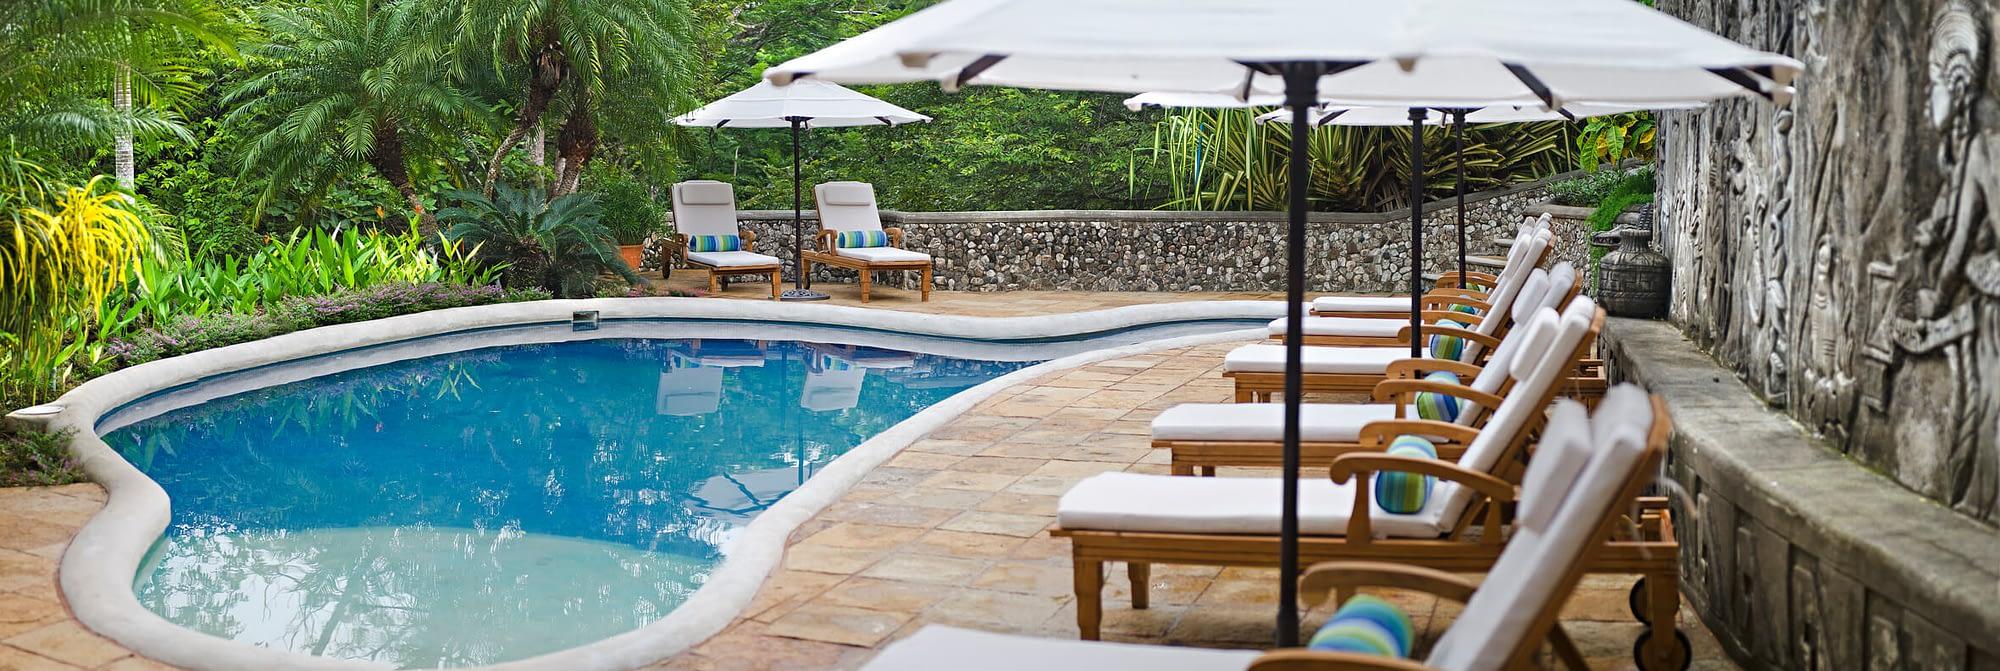 Casa Barrigona Pool Relax Costa Rica